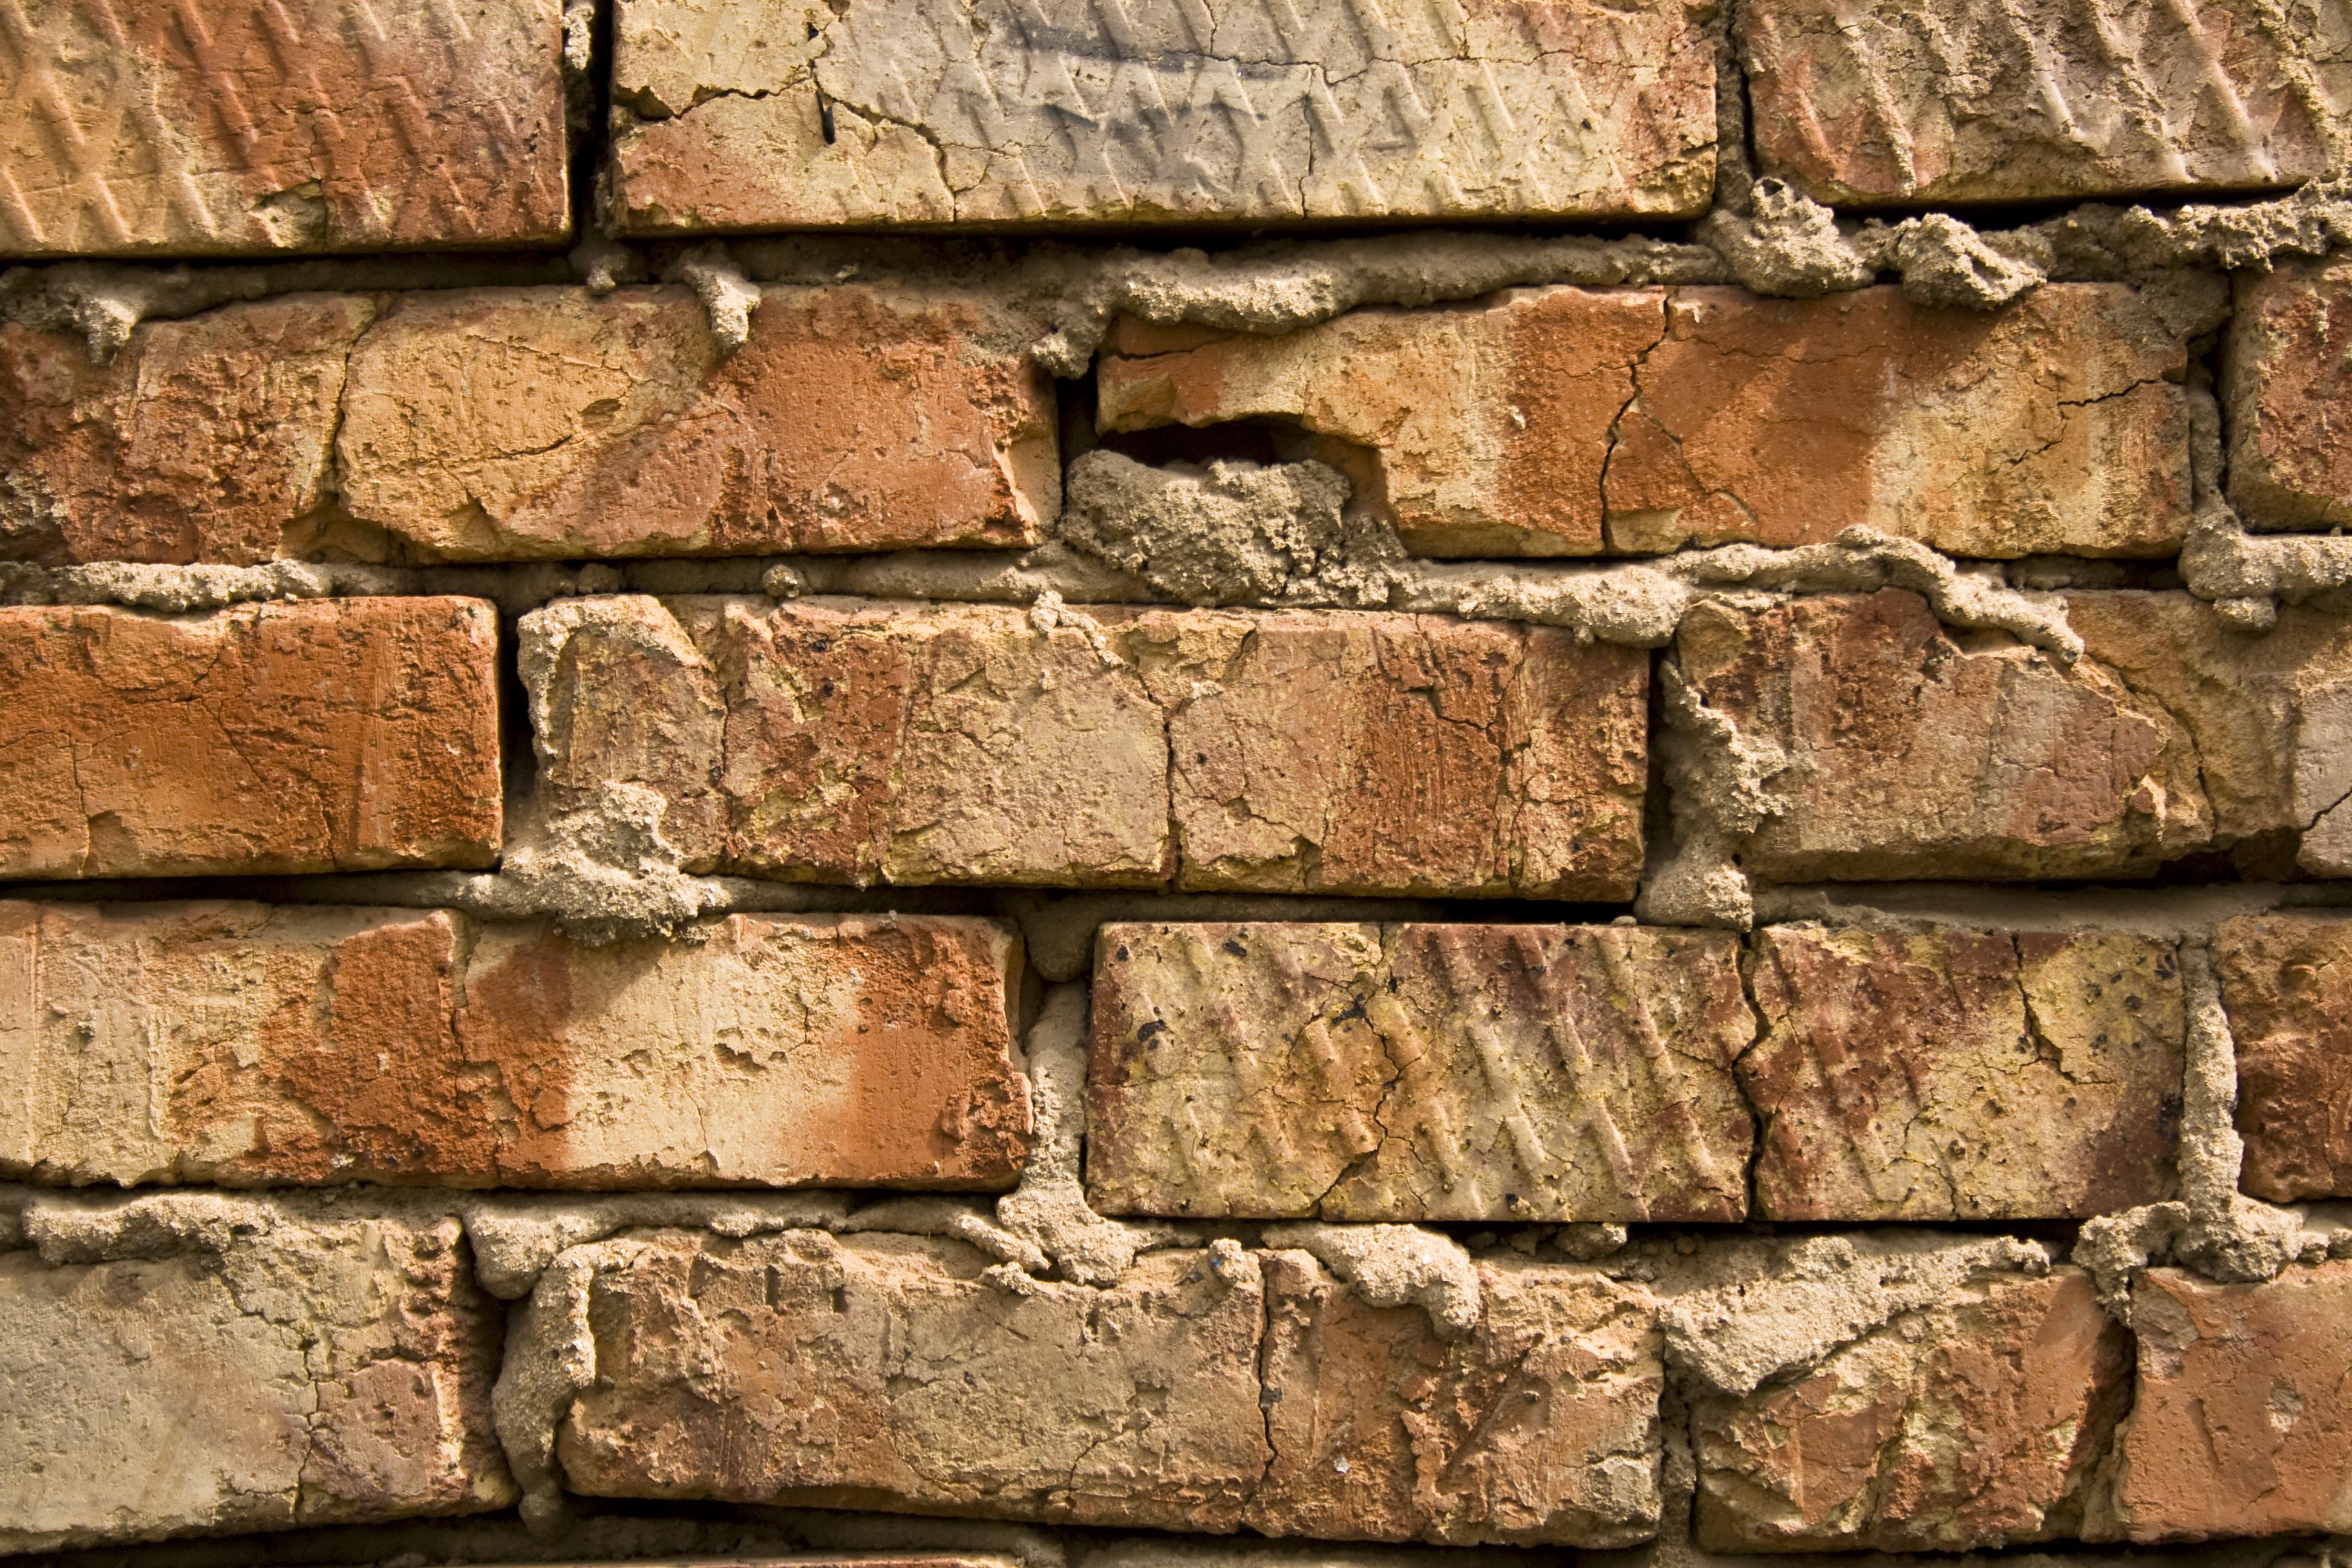 wall, Backgrounds, Stonewall, Revetment, Rock-wall, HQ Photo